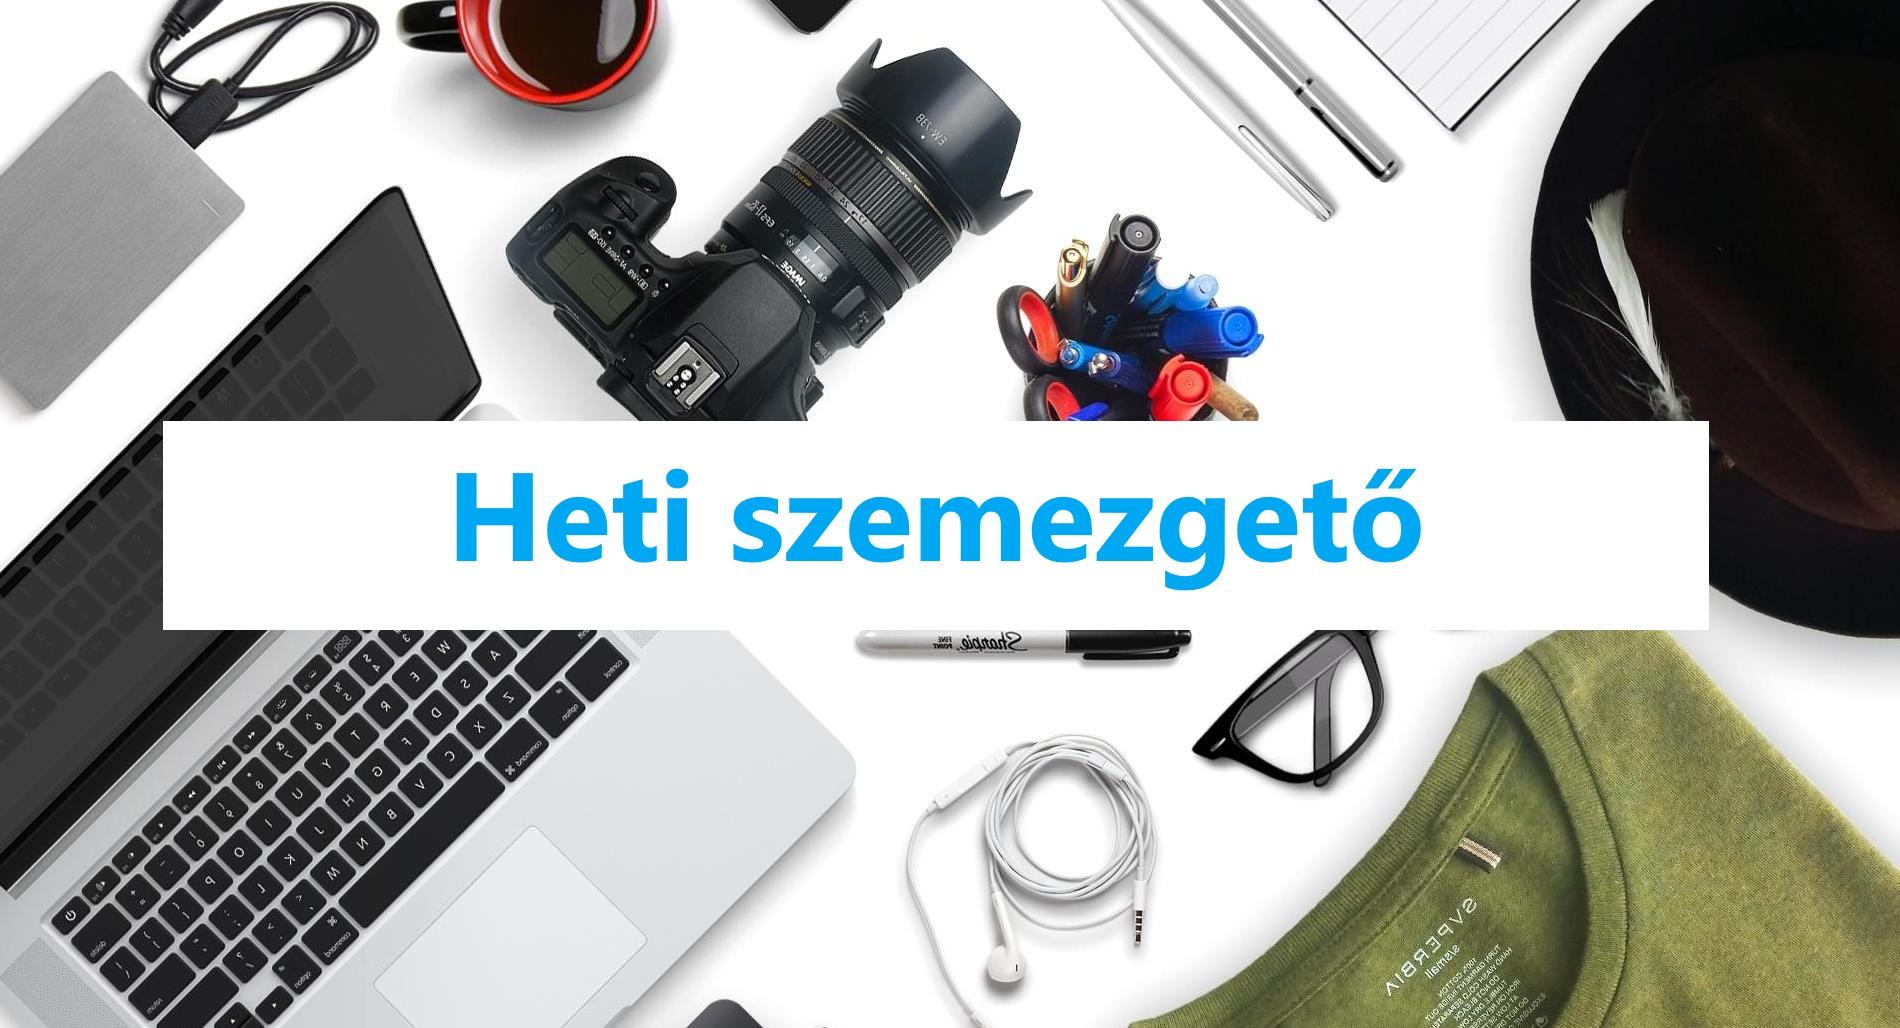 heti_szemezgeto_uj_57.jpg